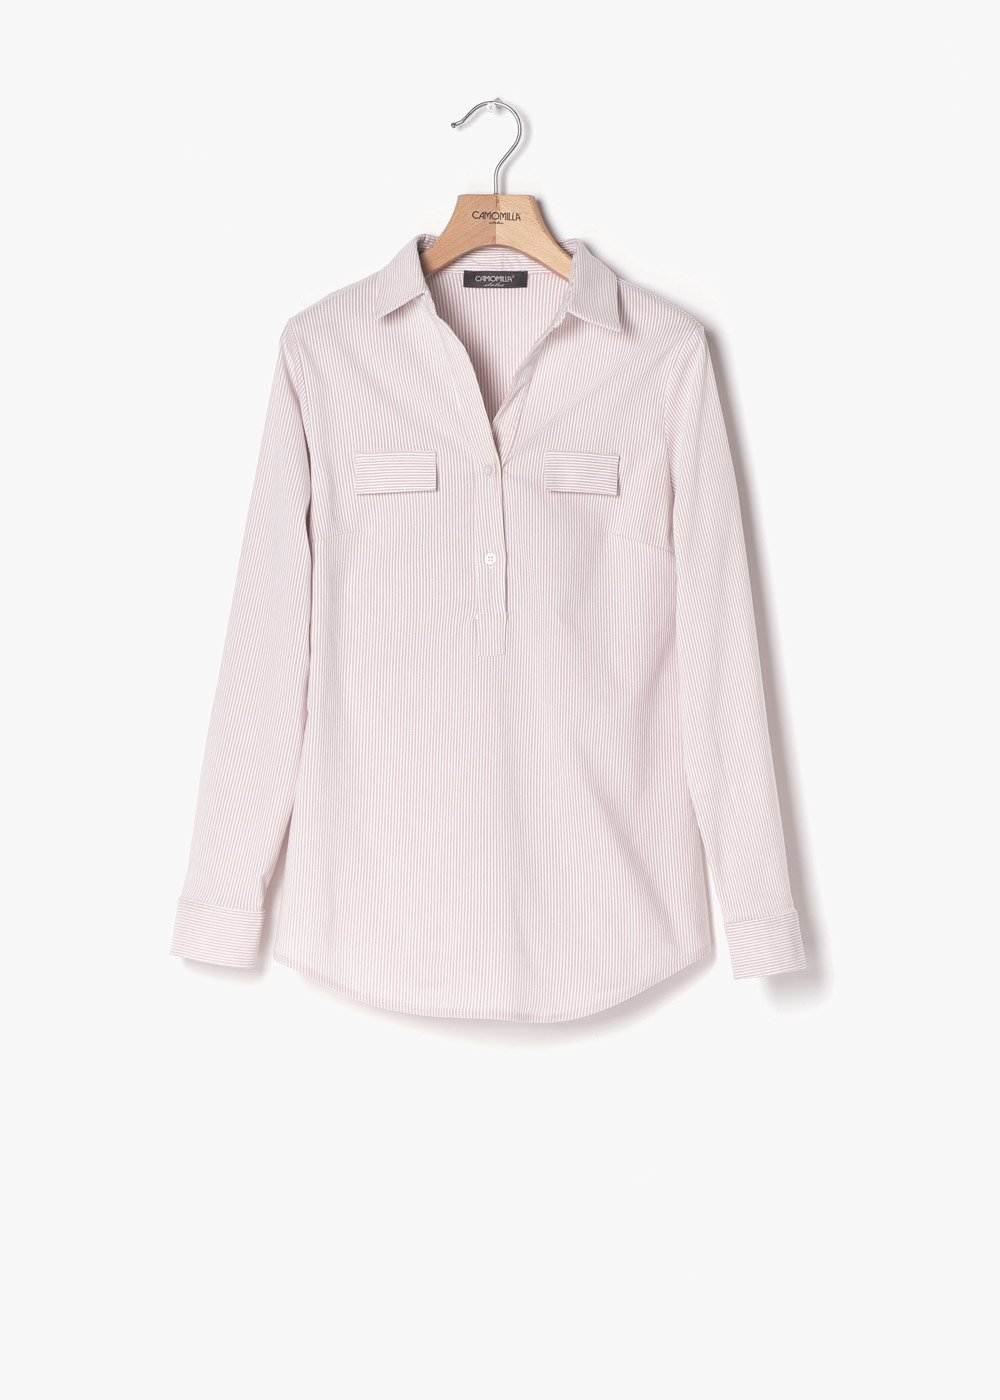 Paola shirt on striped fabric - Rosa / White Stripes - Woman